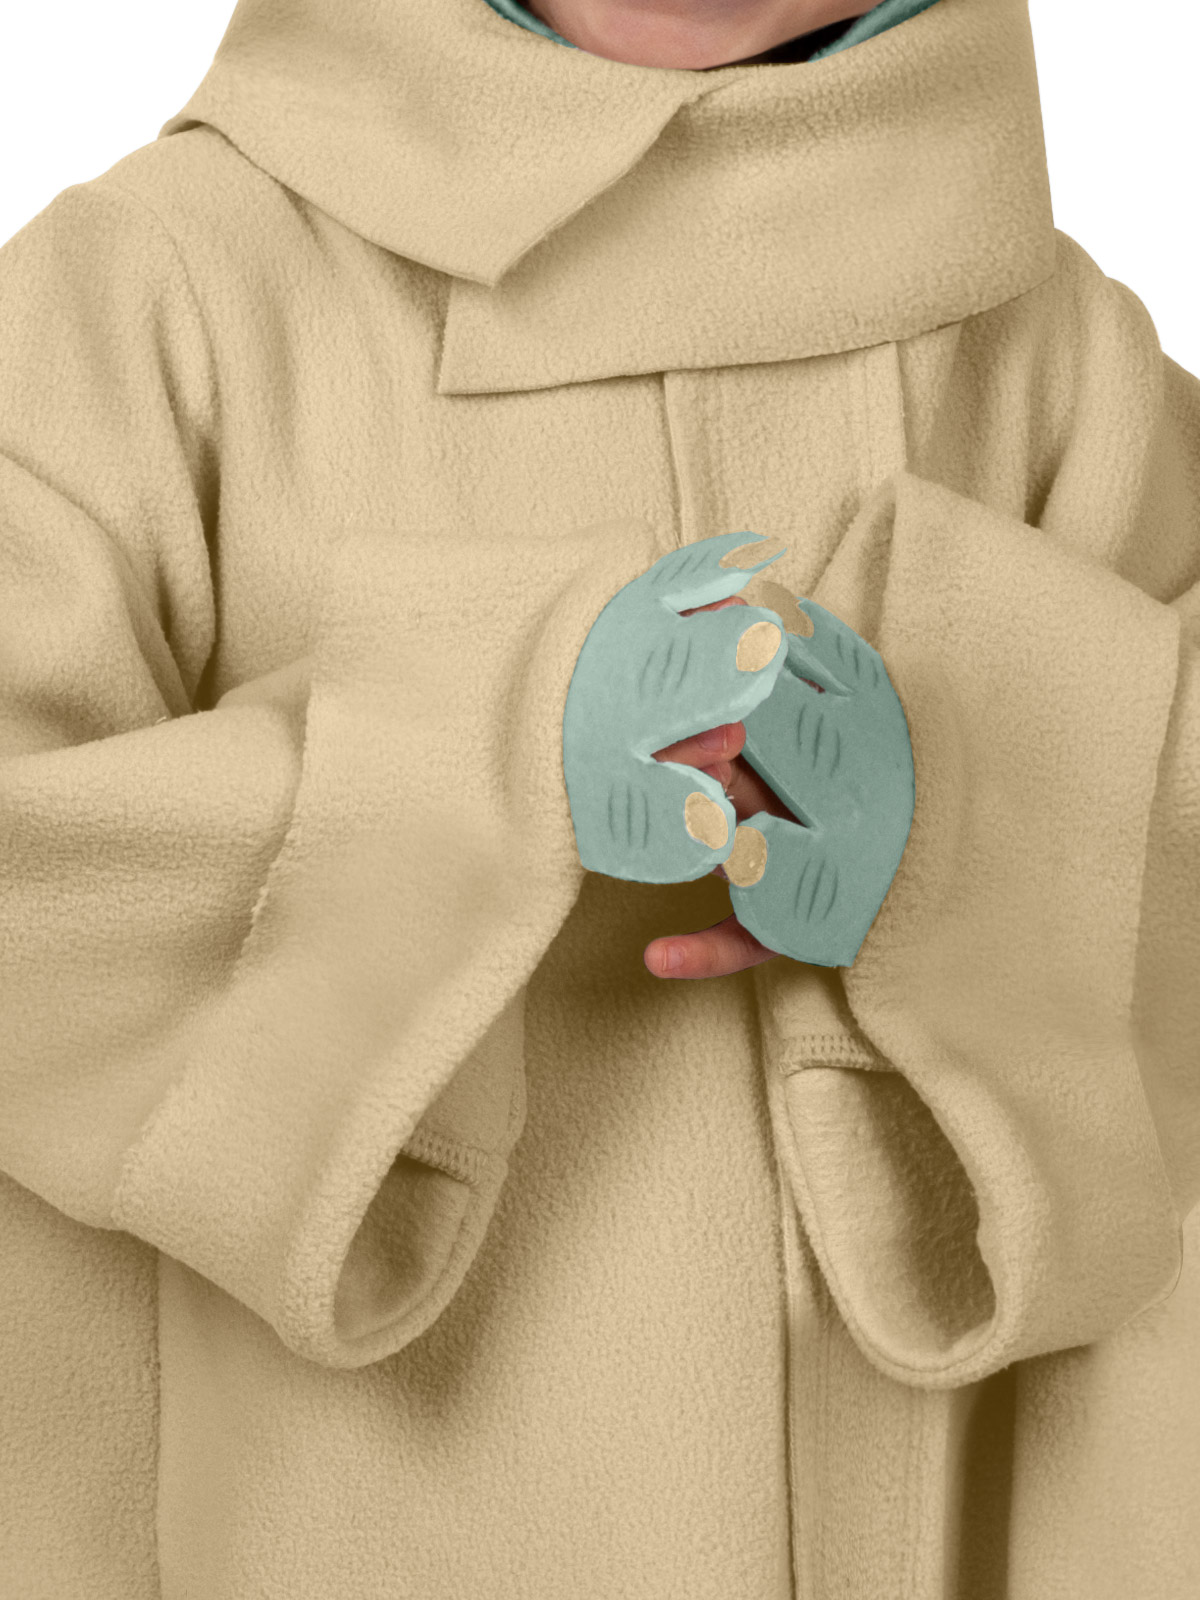 The Child Mandalorian Costume